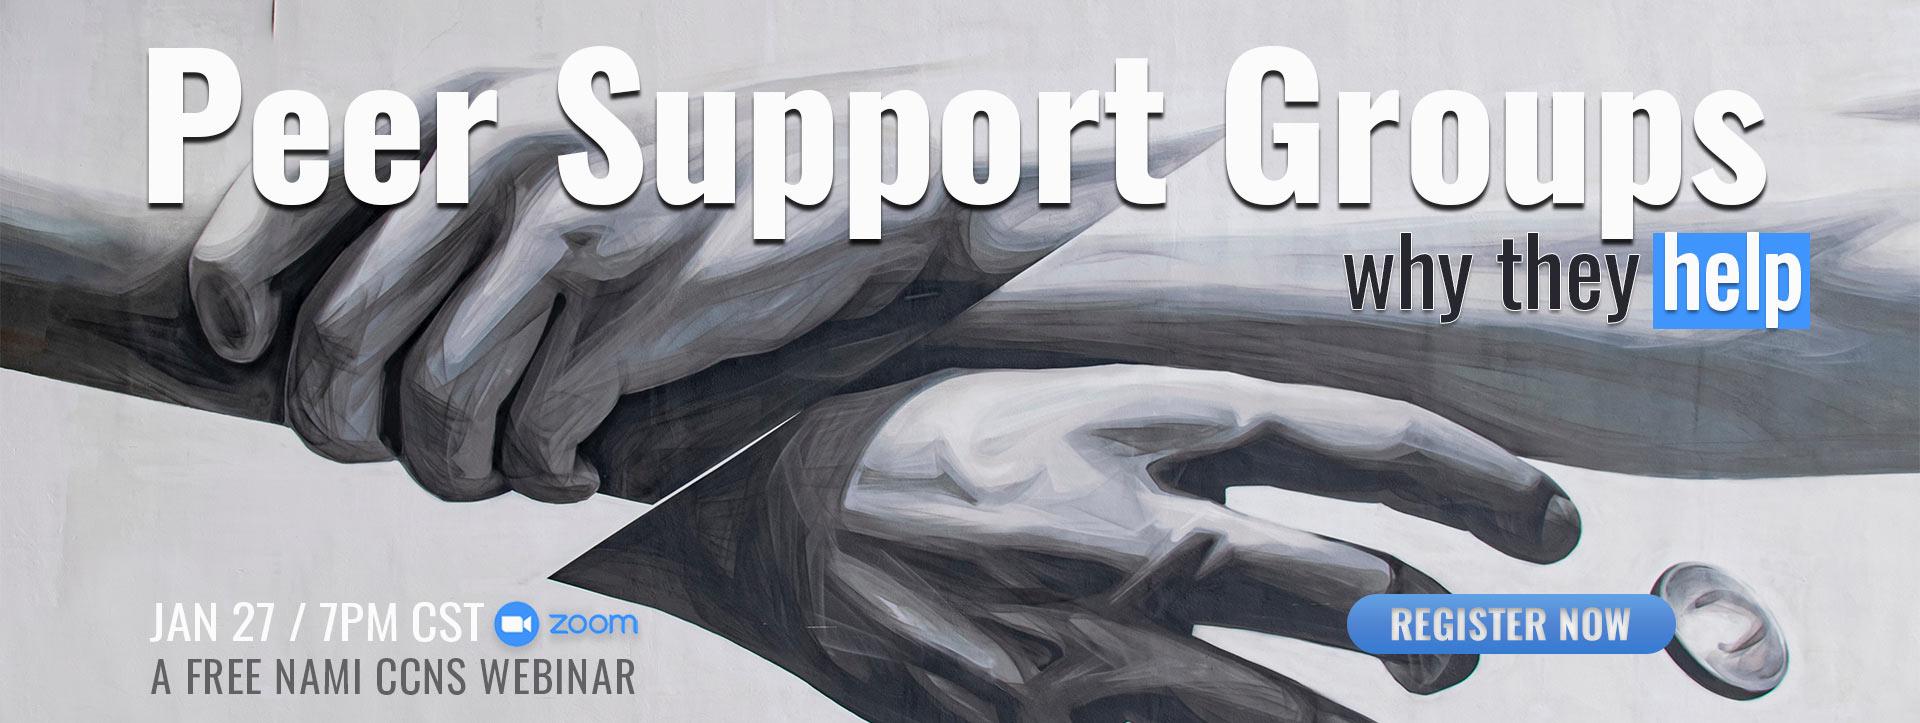 Peer Support Groups - the-mental-health-x-factor_register